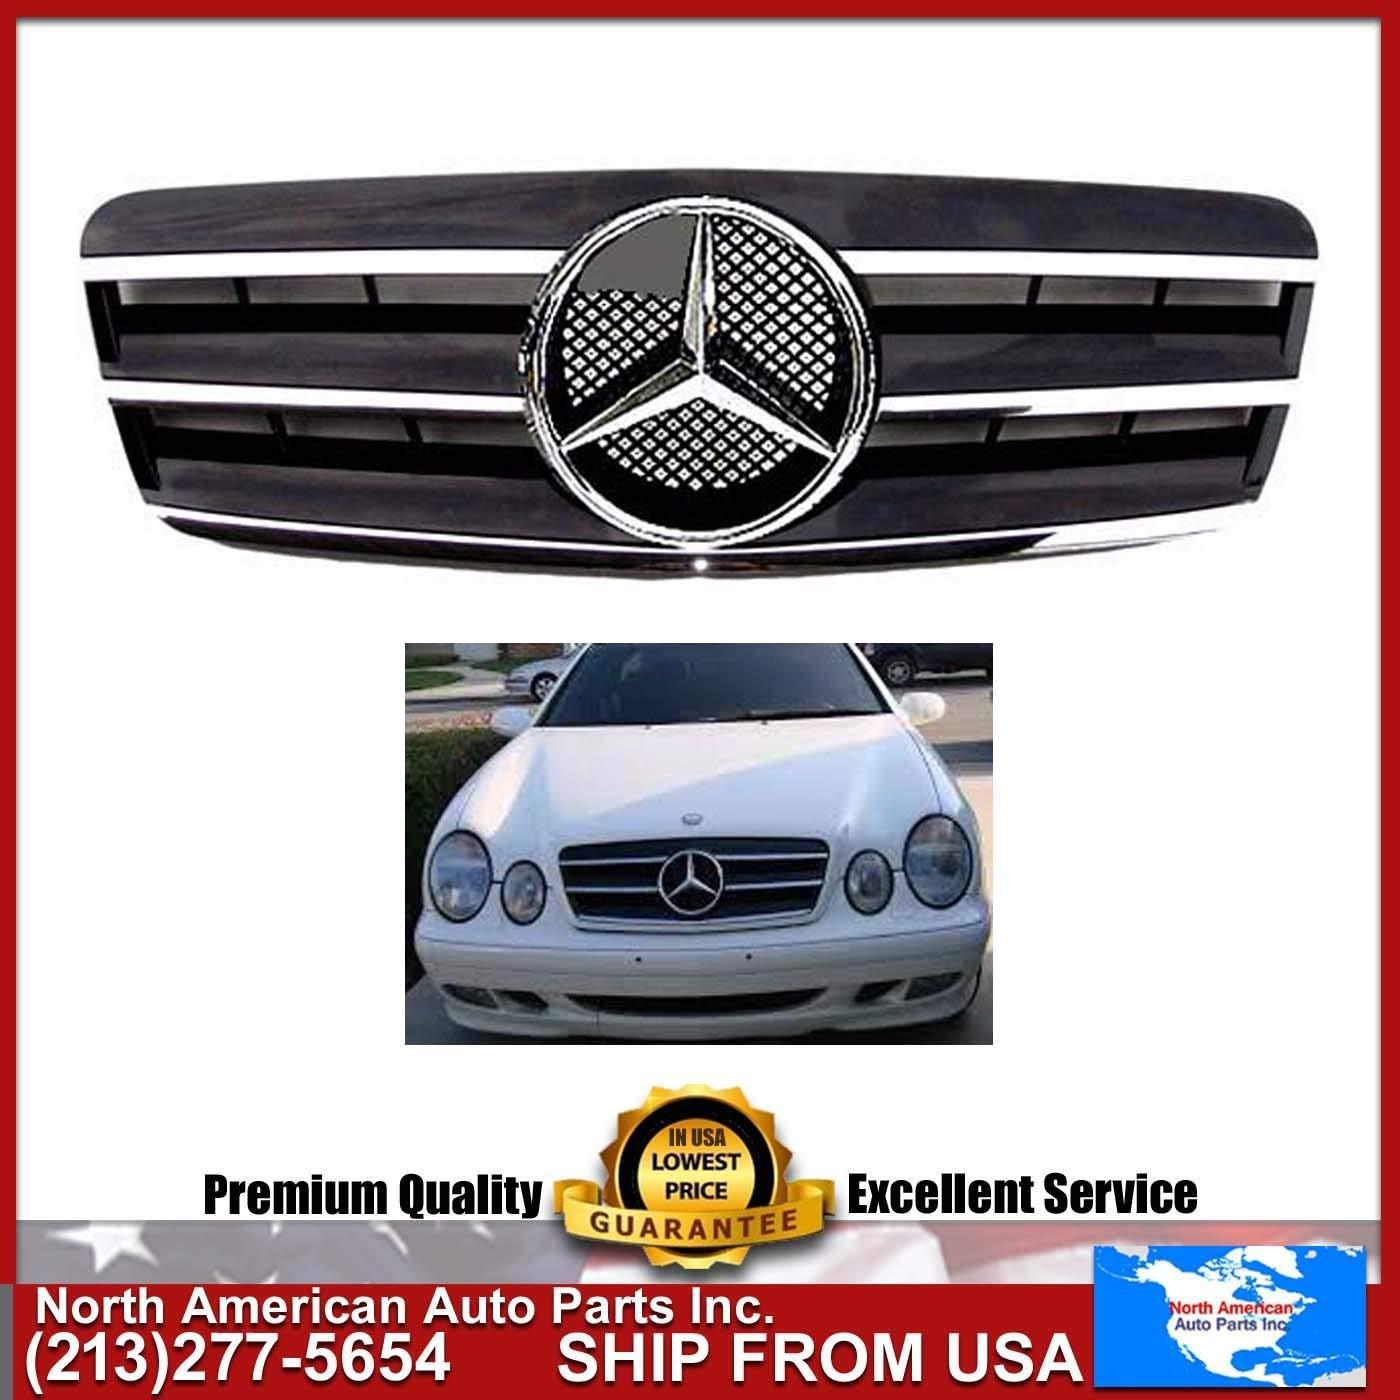 Cheap Benz 320 Clk Find Deals On Line At Alibabacom 1999 Mercedes Ml430 Fuel Filter Get Quotations 98 02 W208 Black Chrome Grille Star Amg Clk320 Clk430 Emblem